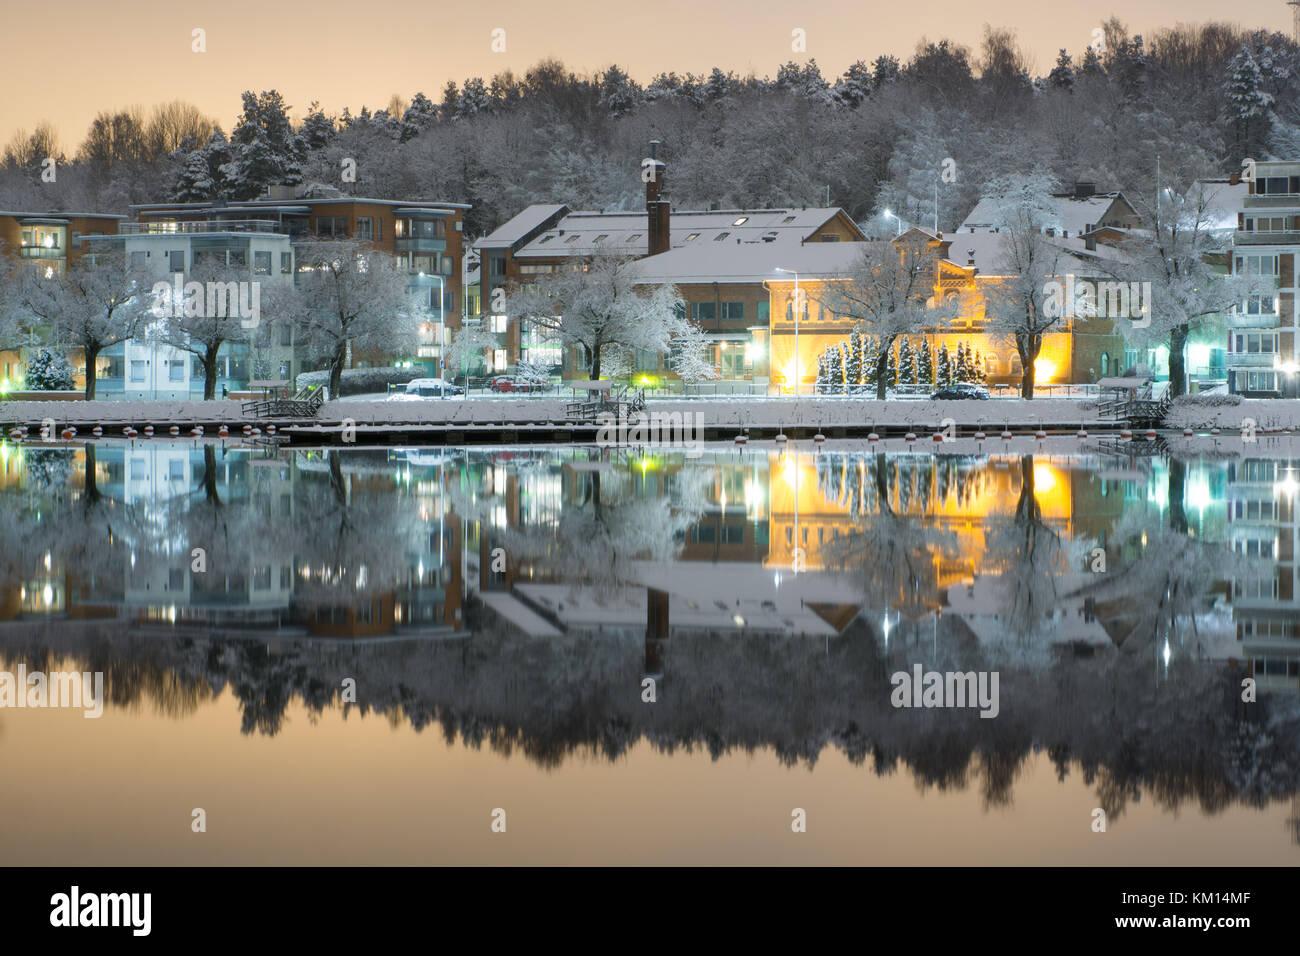 Reflection of the lake Saimaa in Lappeenranta - Stock Image